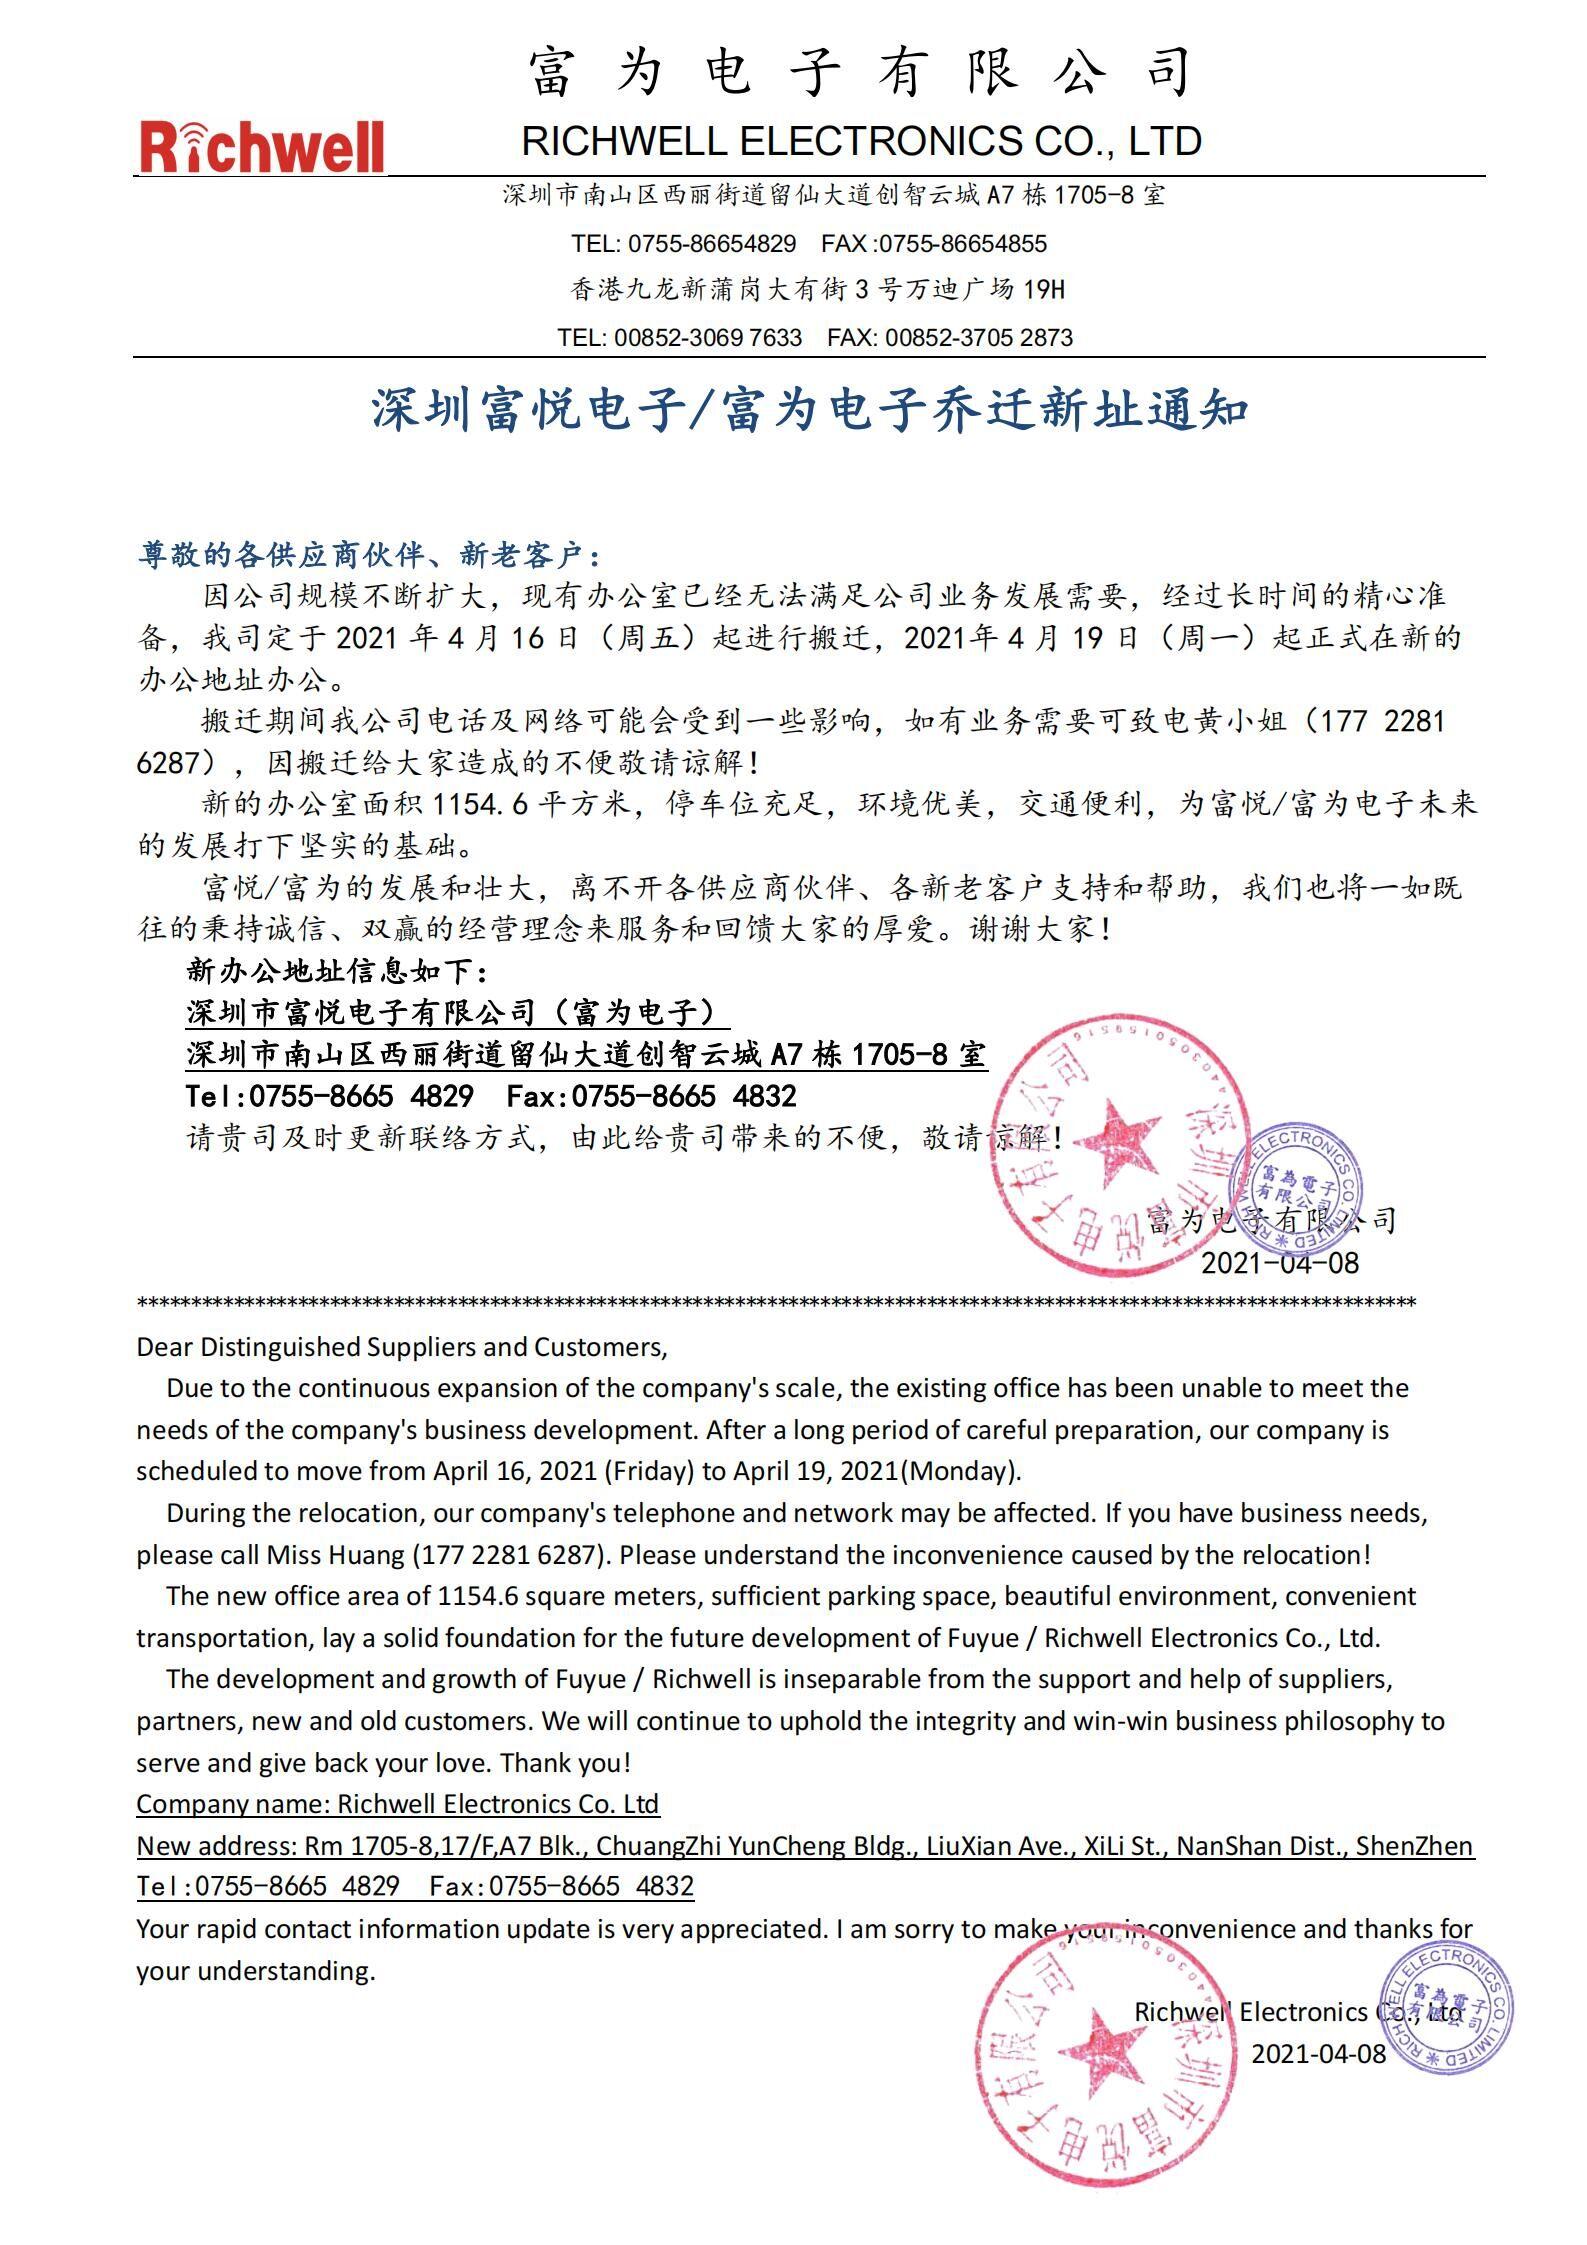 Shenzhen Fuyue Electronics&Richwell Electronics Notice of relocation